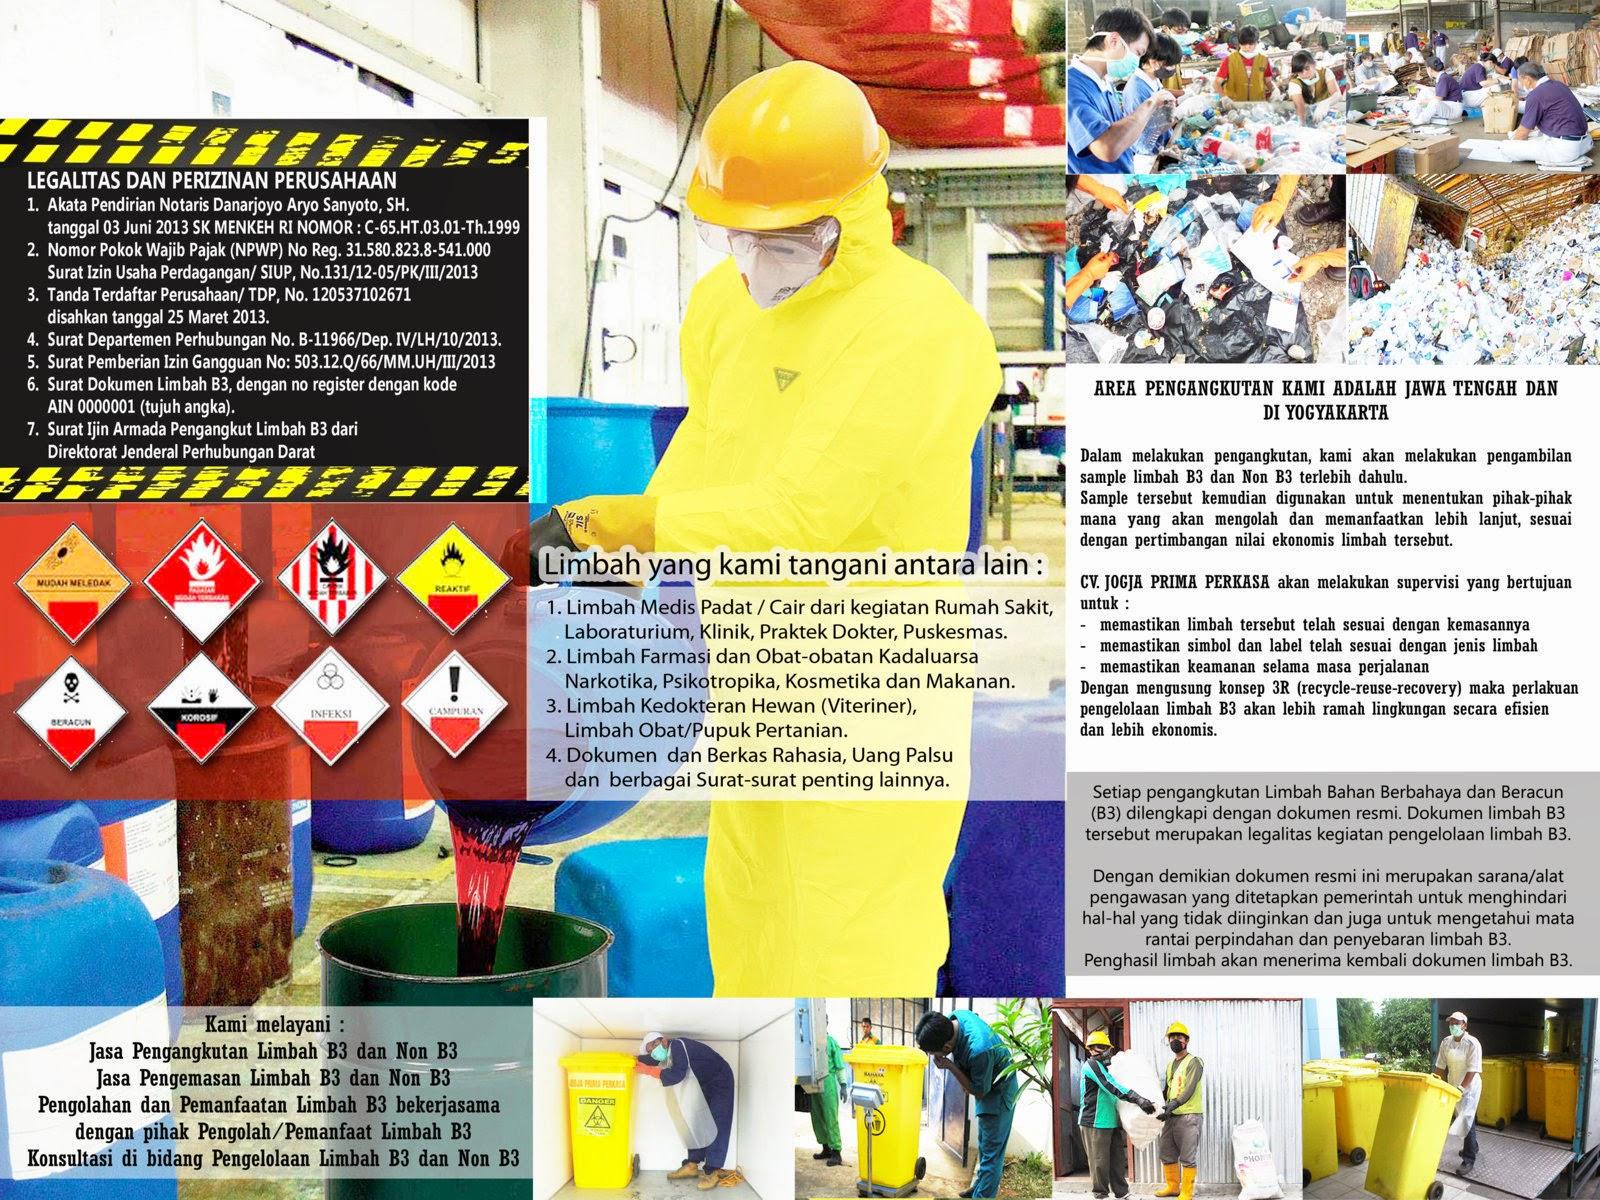 Jasa Transportasi Limbah B3, medis, cair, industri Jakarta, Bandung, Jogja, Semarang, Surabaya, Solo